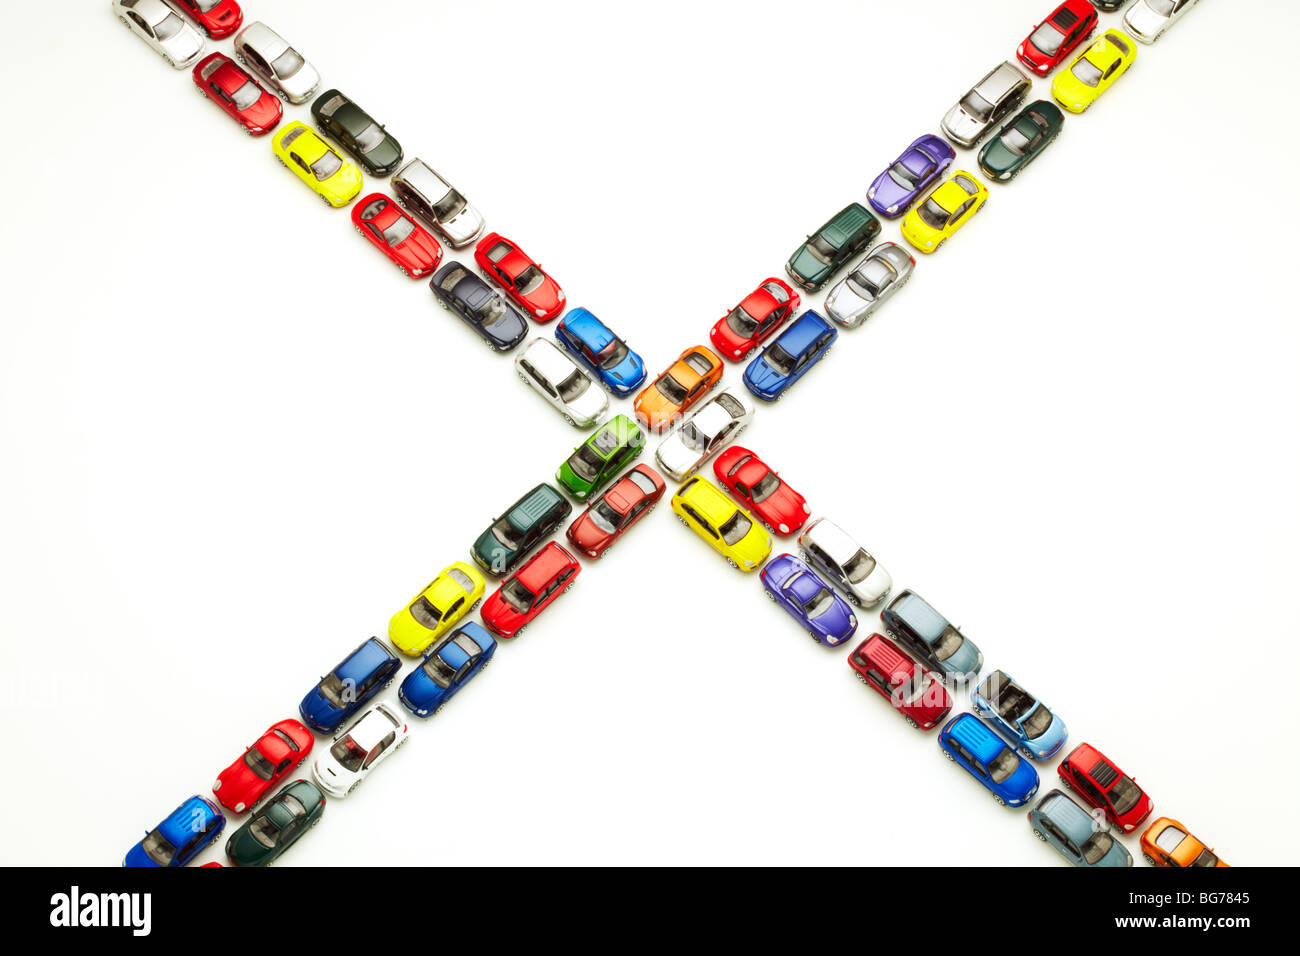 Model Cars in X Shape - Stock Image